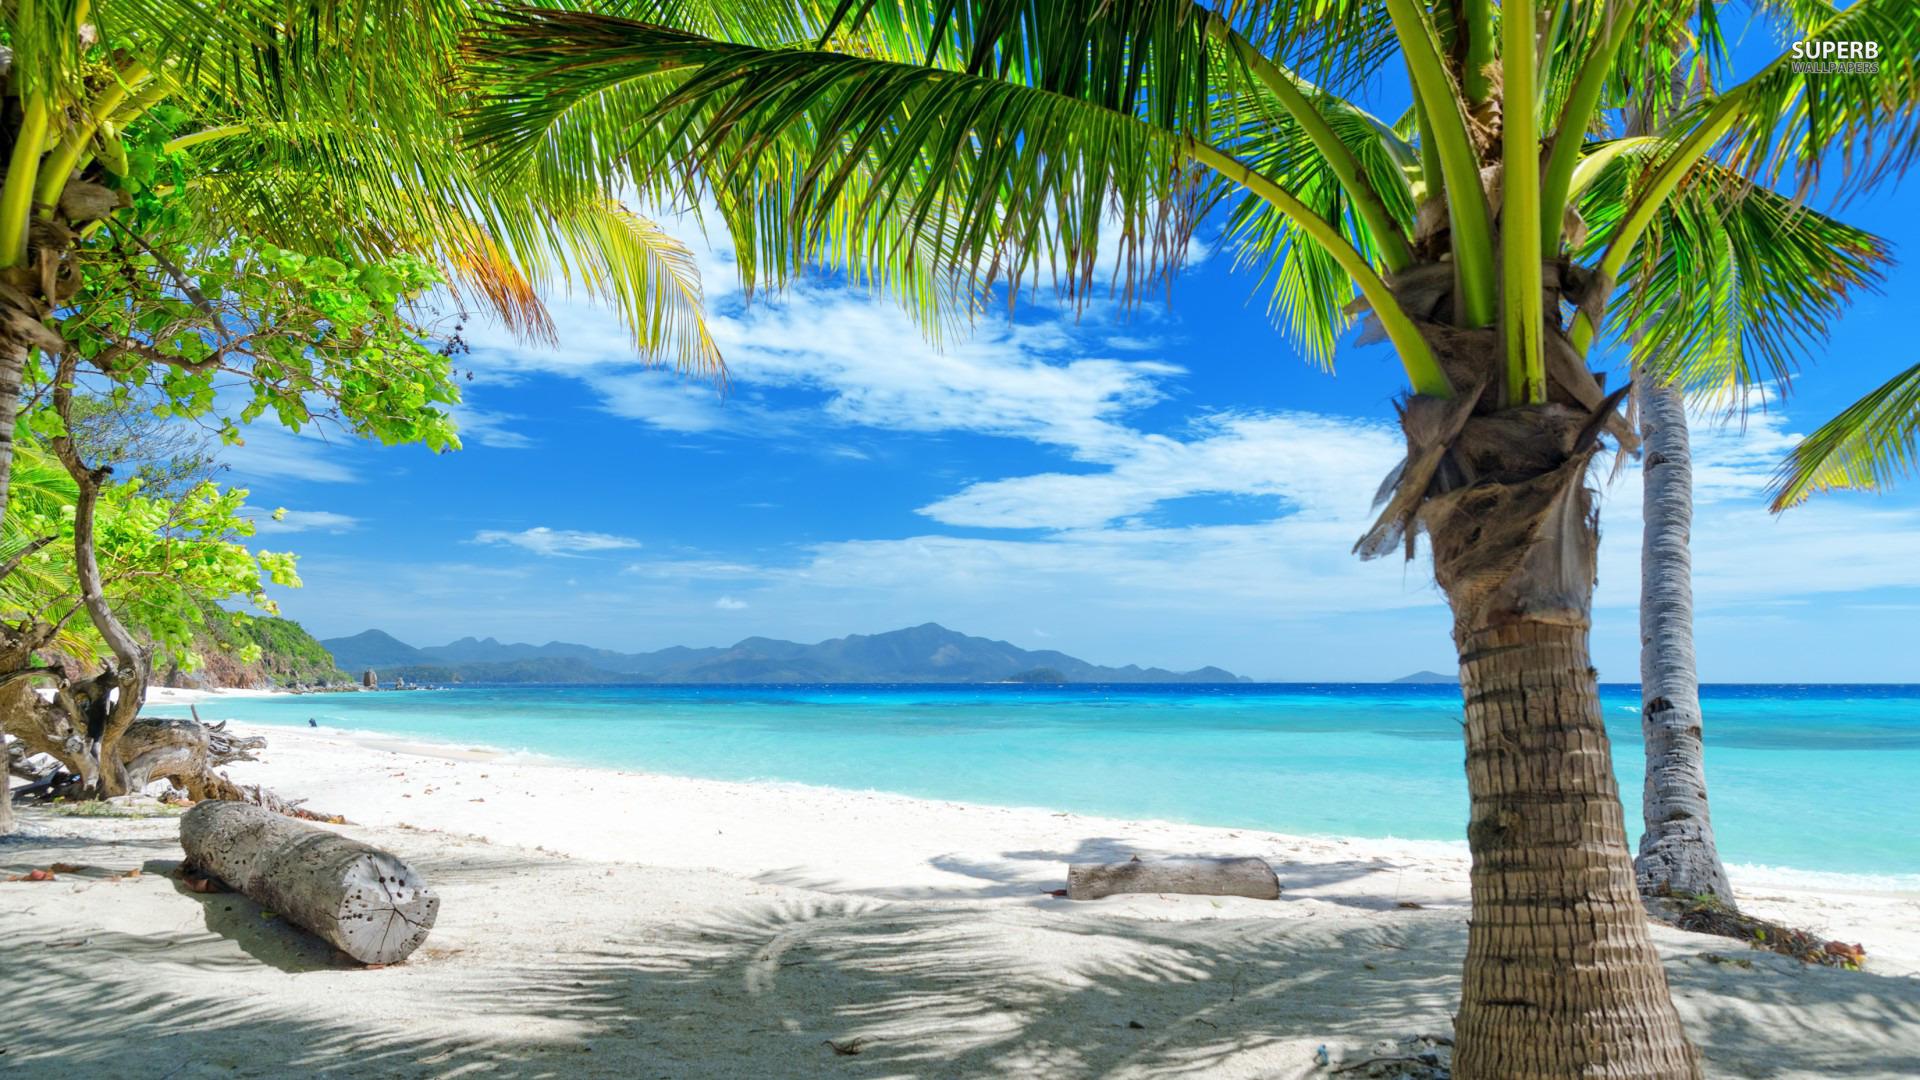 tropical beach   Beautiful Beach Wallpapers HD 1920x1080